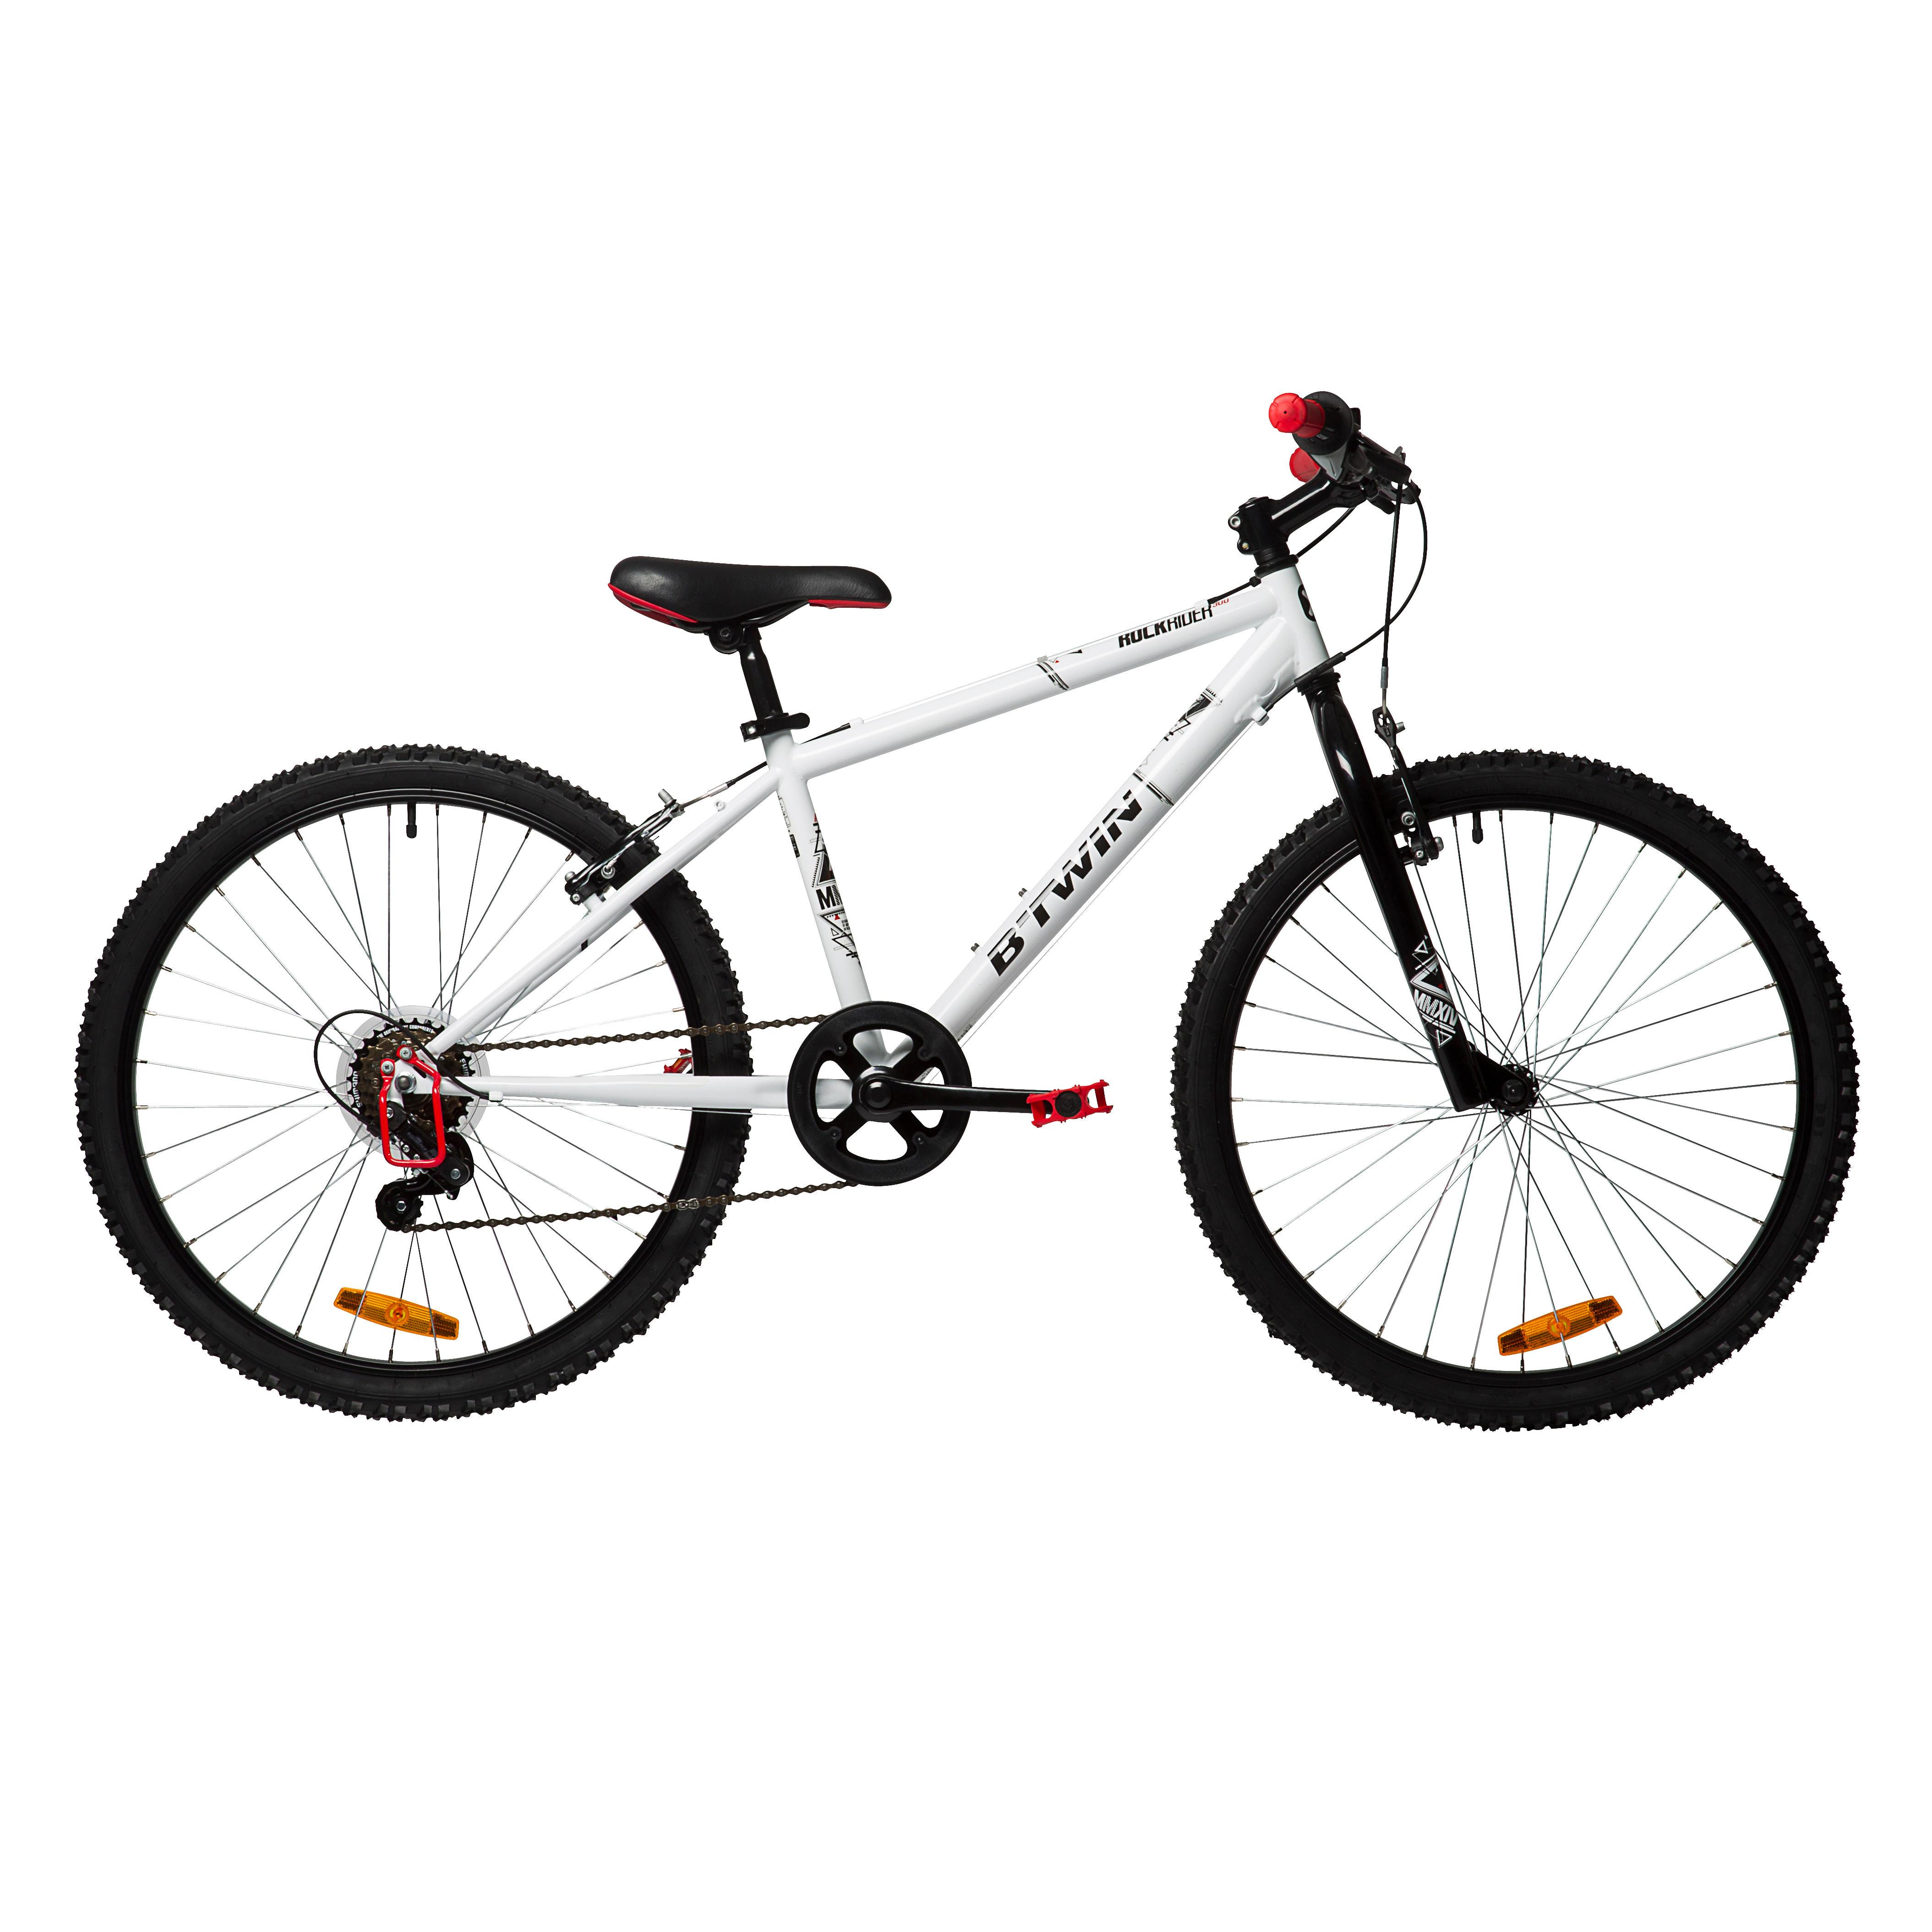 4ecb9505343 Kinderfahrrad | günstige & moderne Räder | B'TWIN | DECATHLON